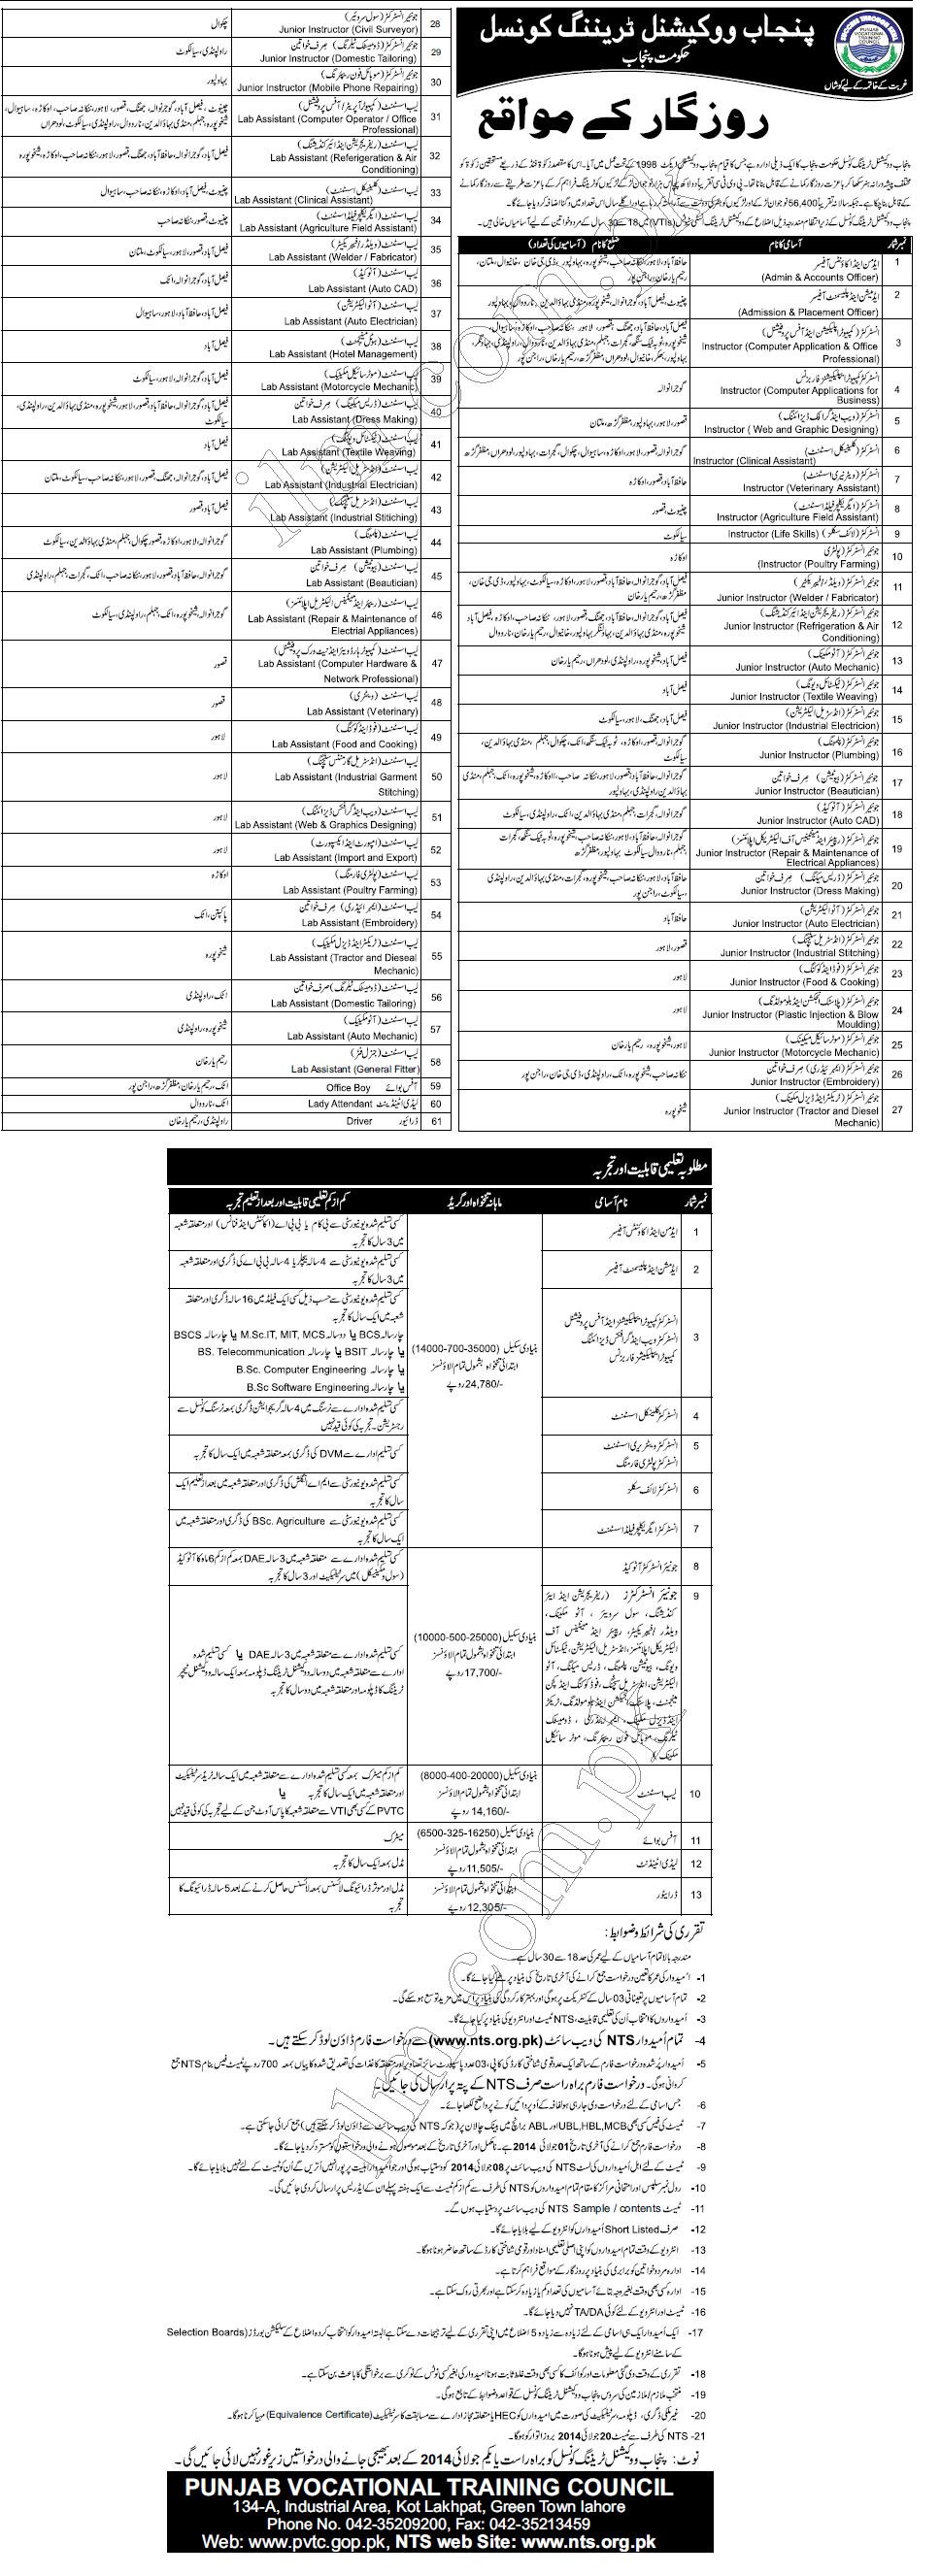 vocational training council pvtc nts jobs form punjab vocational training council pvtc nts jobs 2014 form